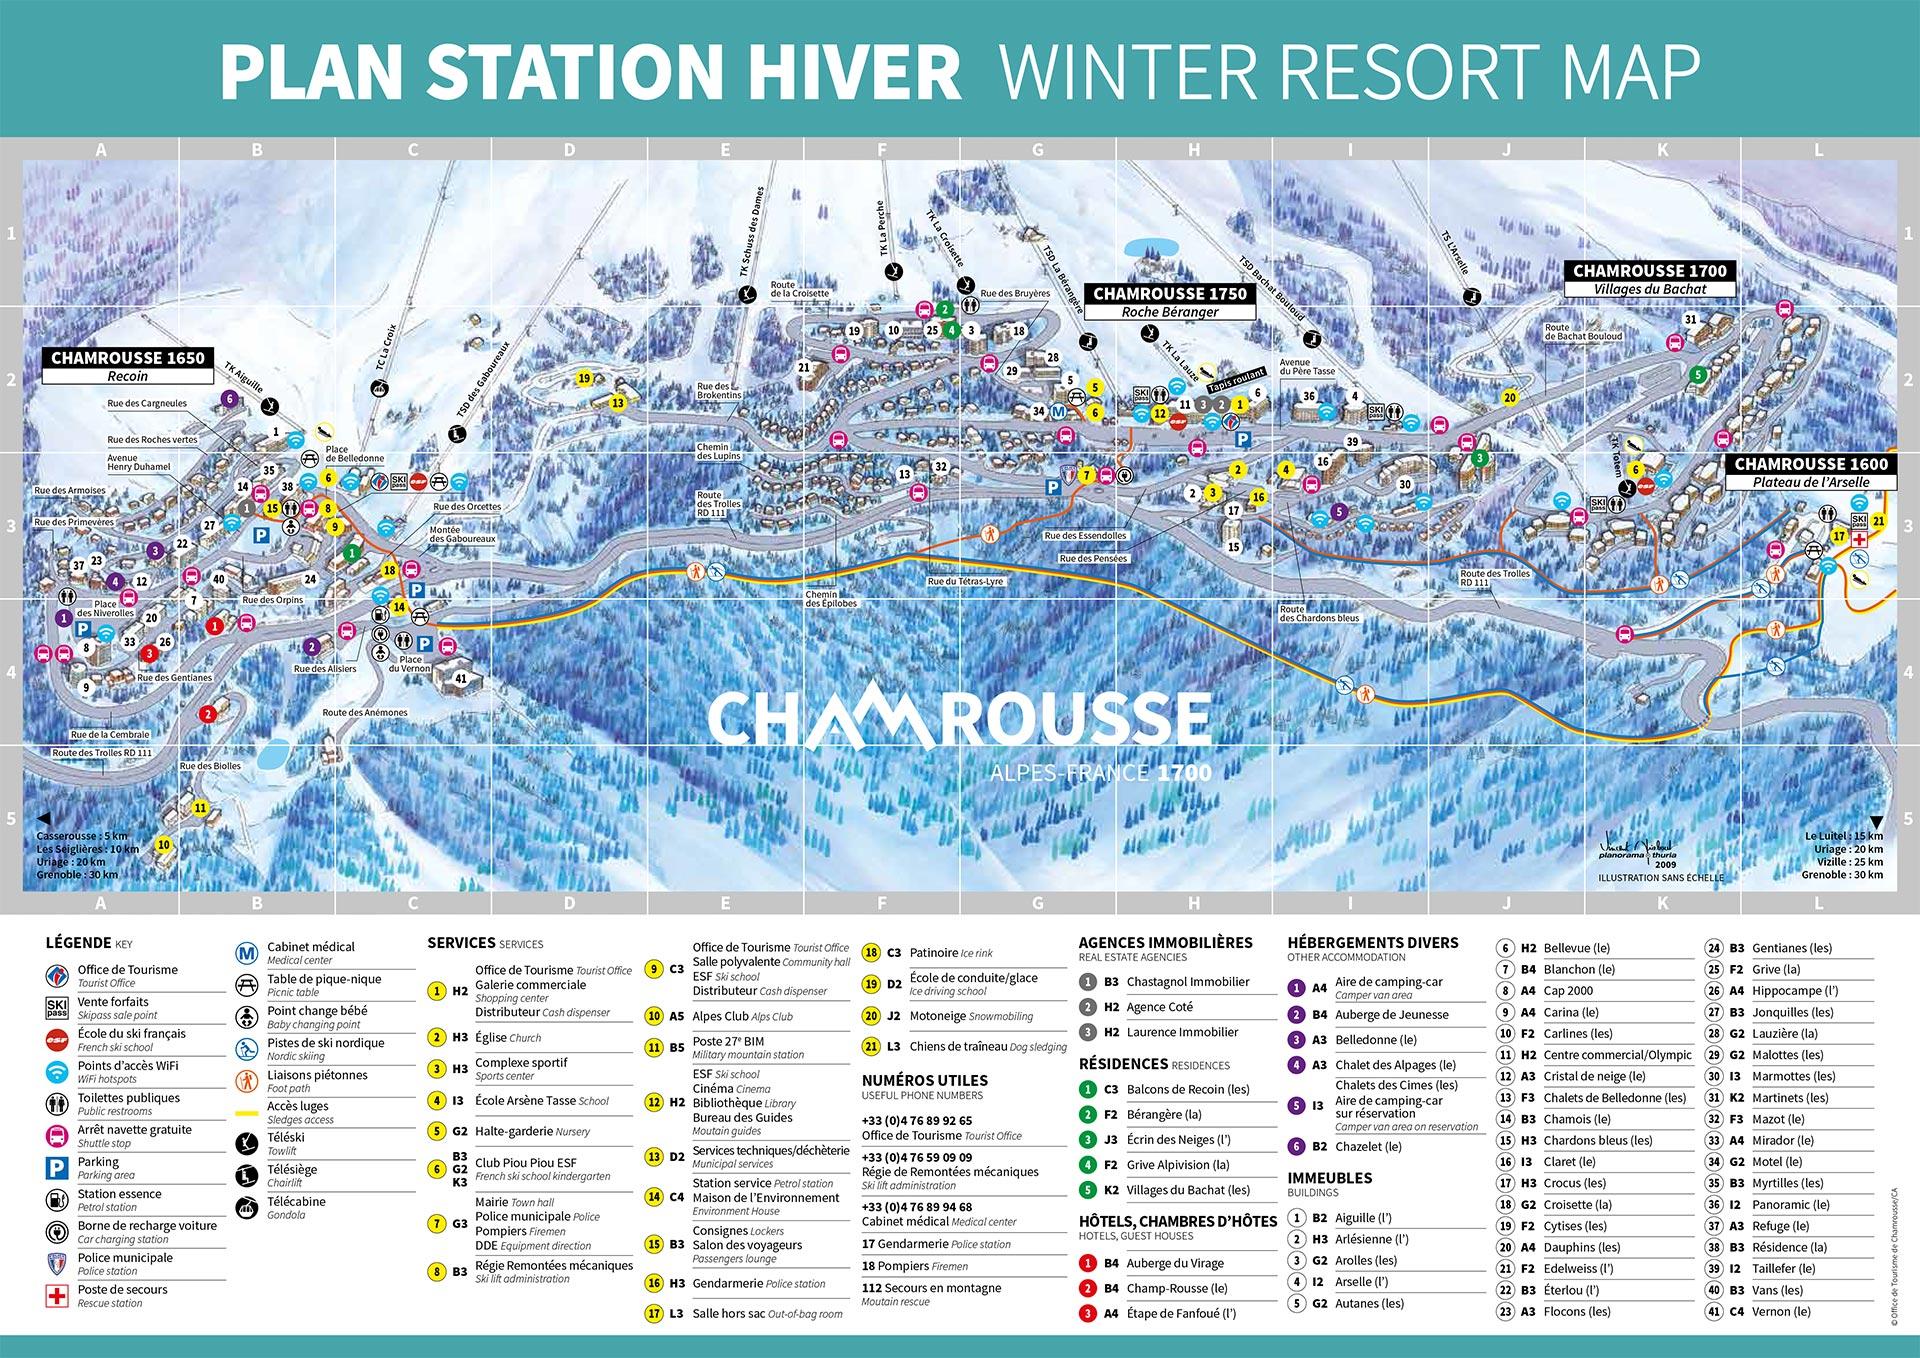 Chamrousse plan station hiver ski montagne grenoble lyon isère alpes france